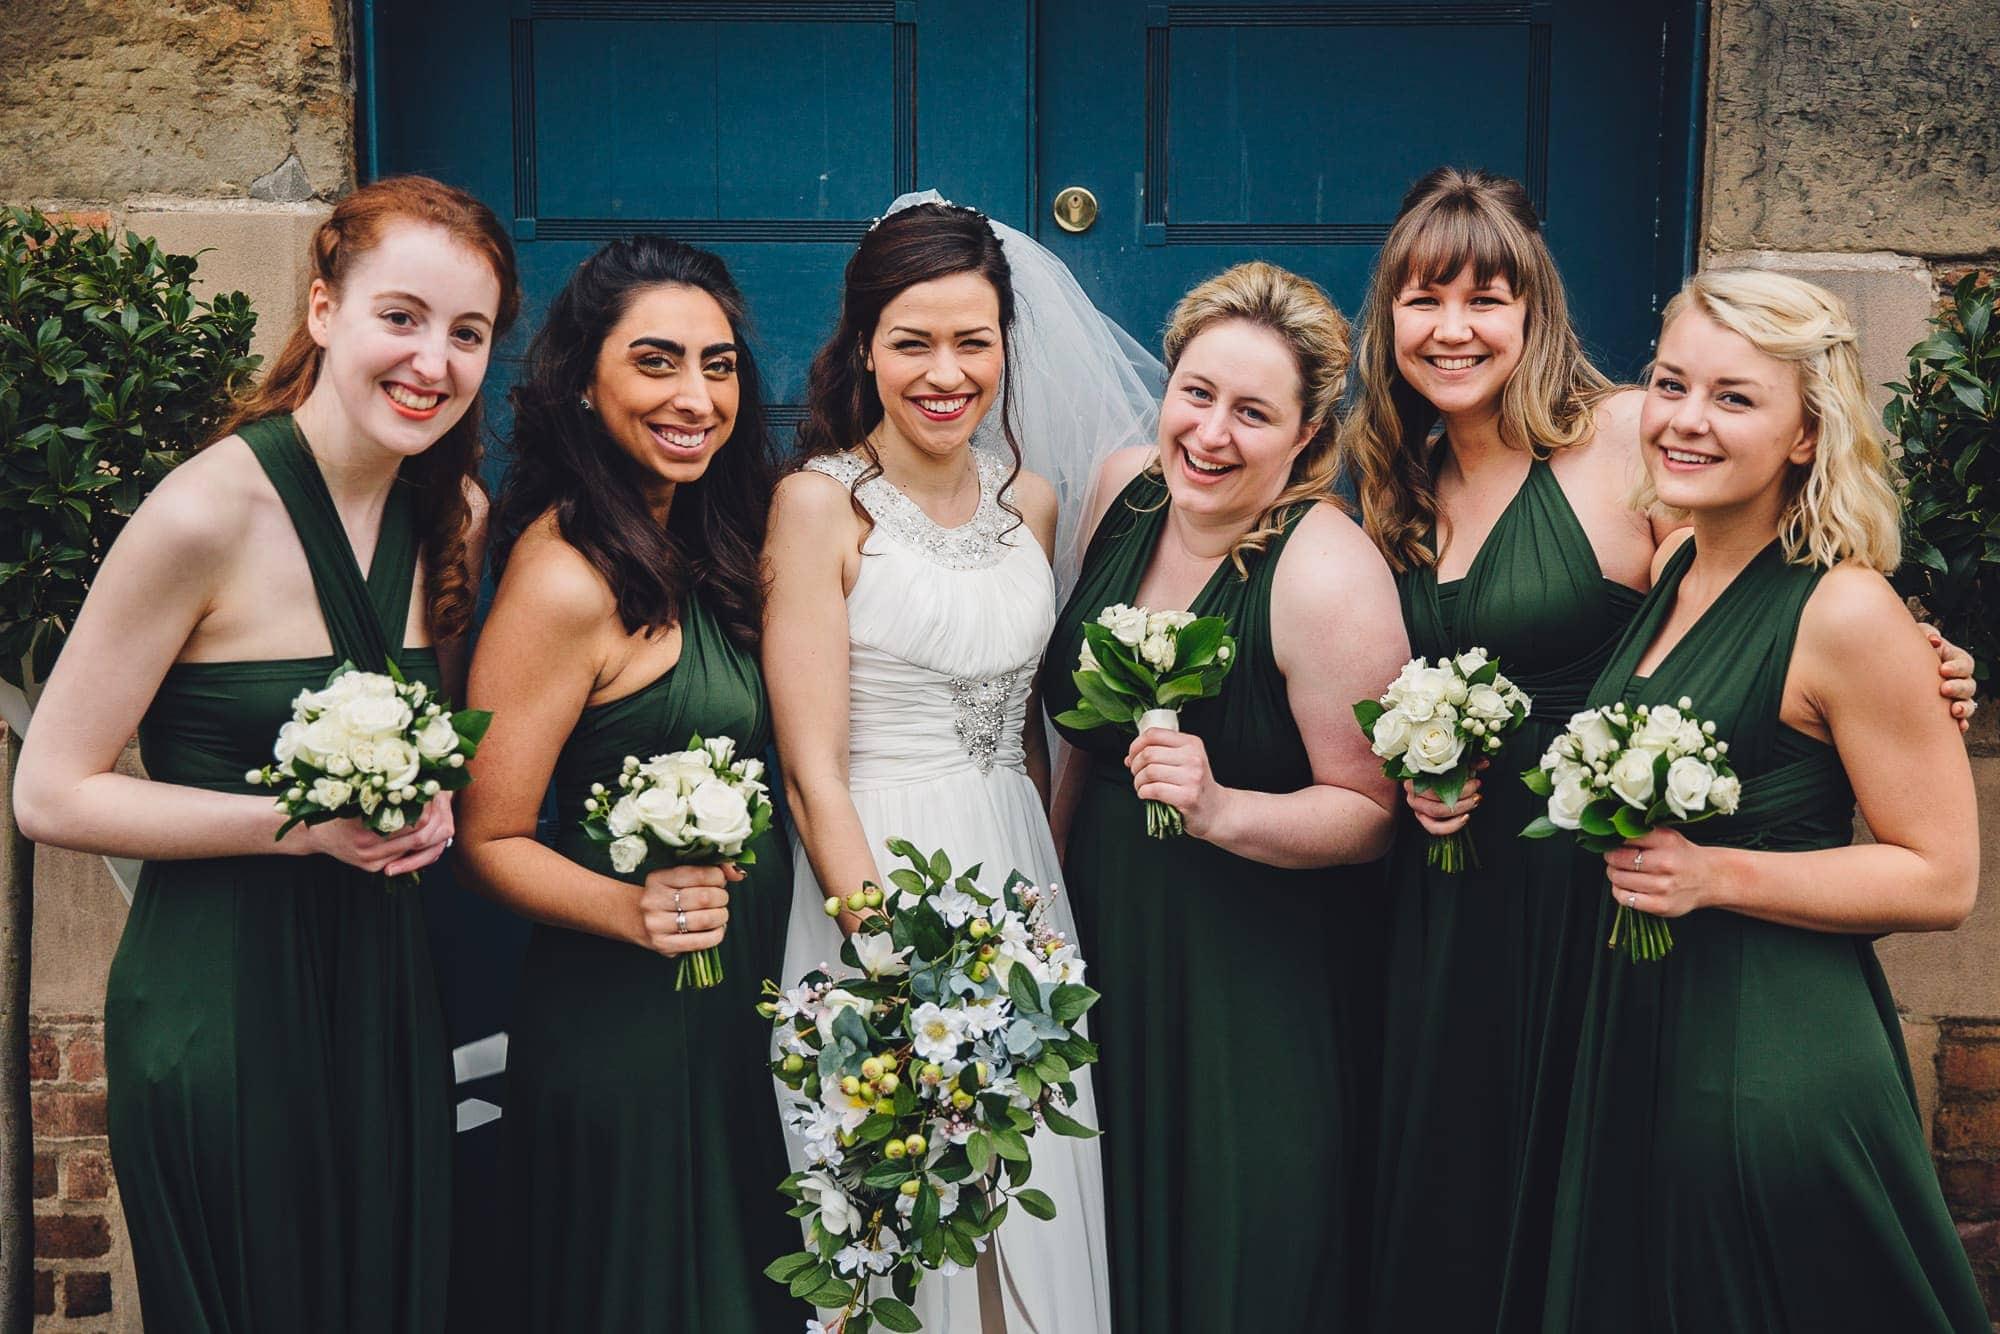 Matlt-Cross-Nottingham-wedding-Photography-35